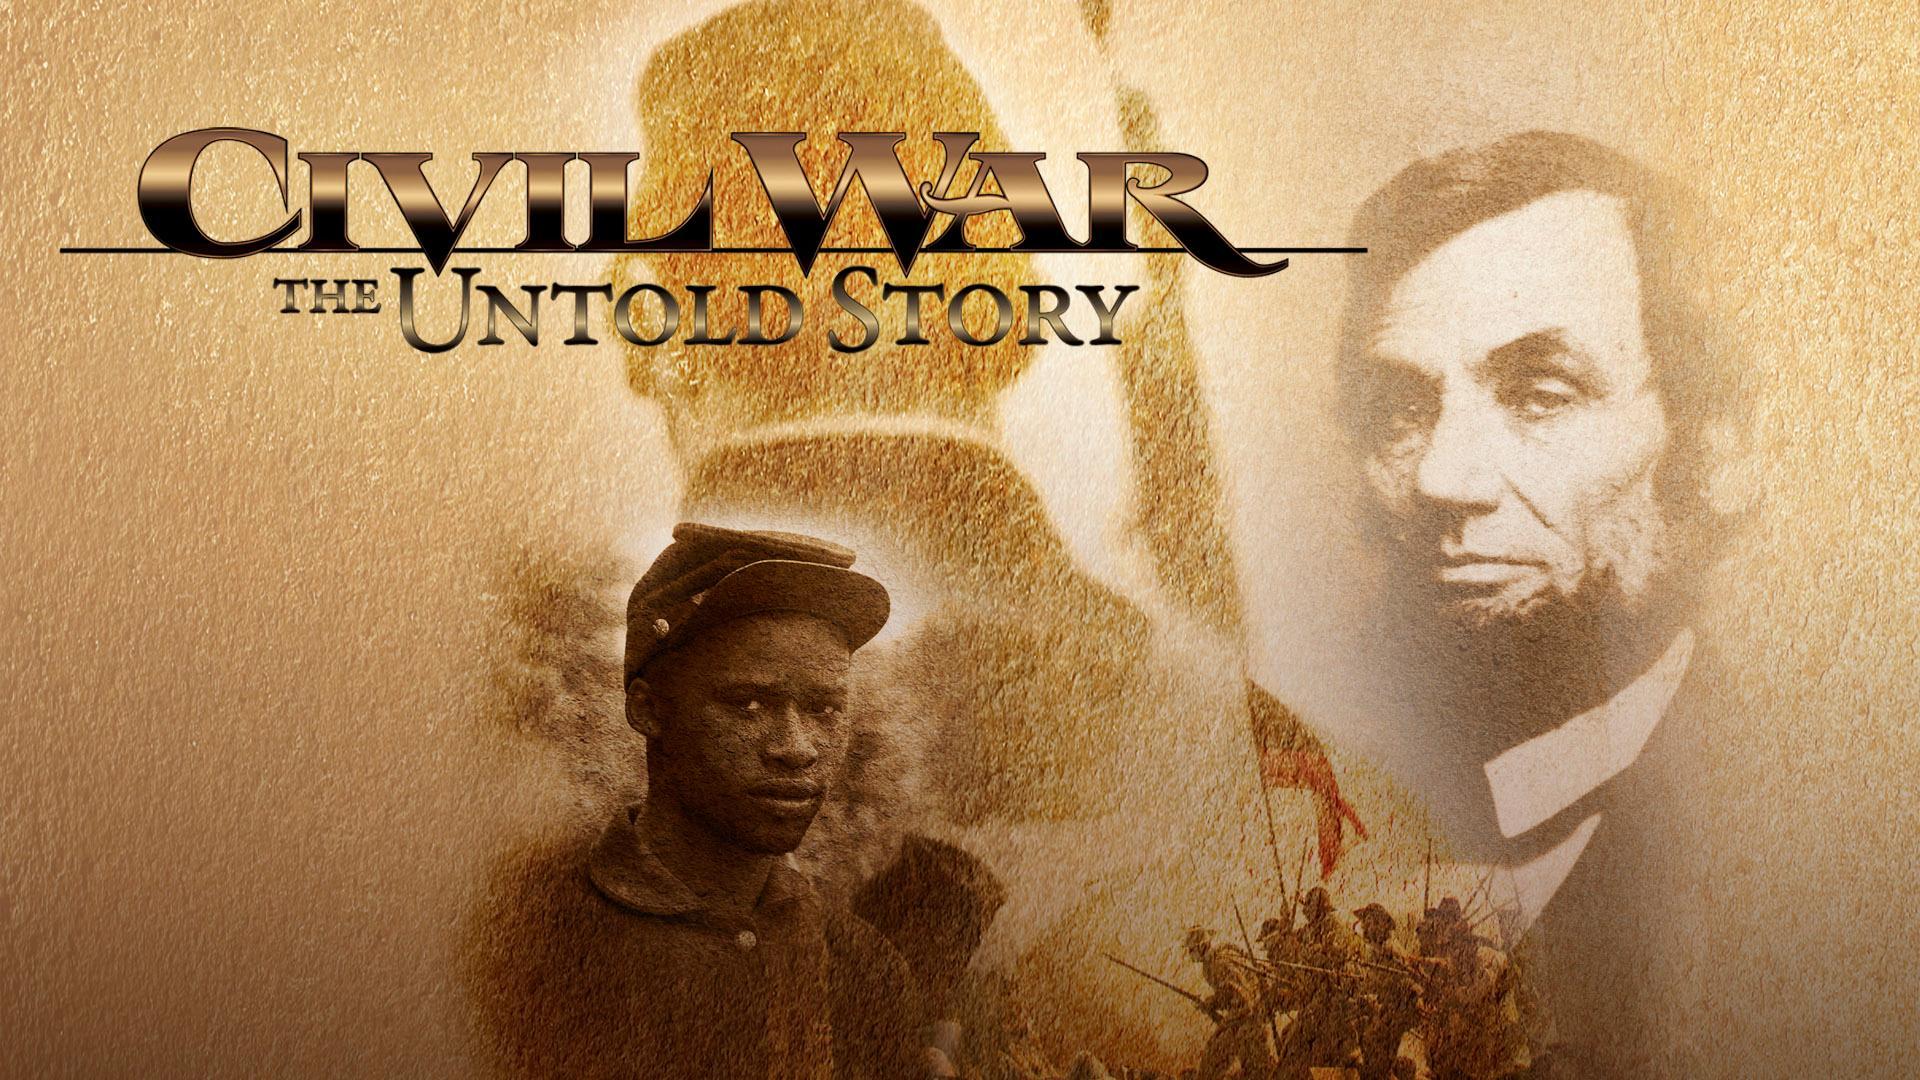 Civil War : the Untold Story